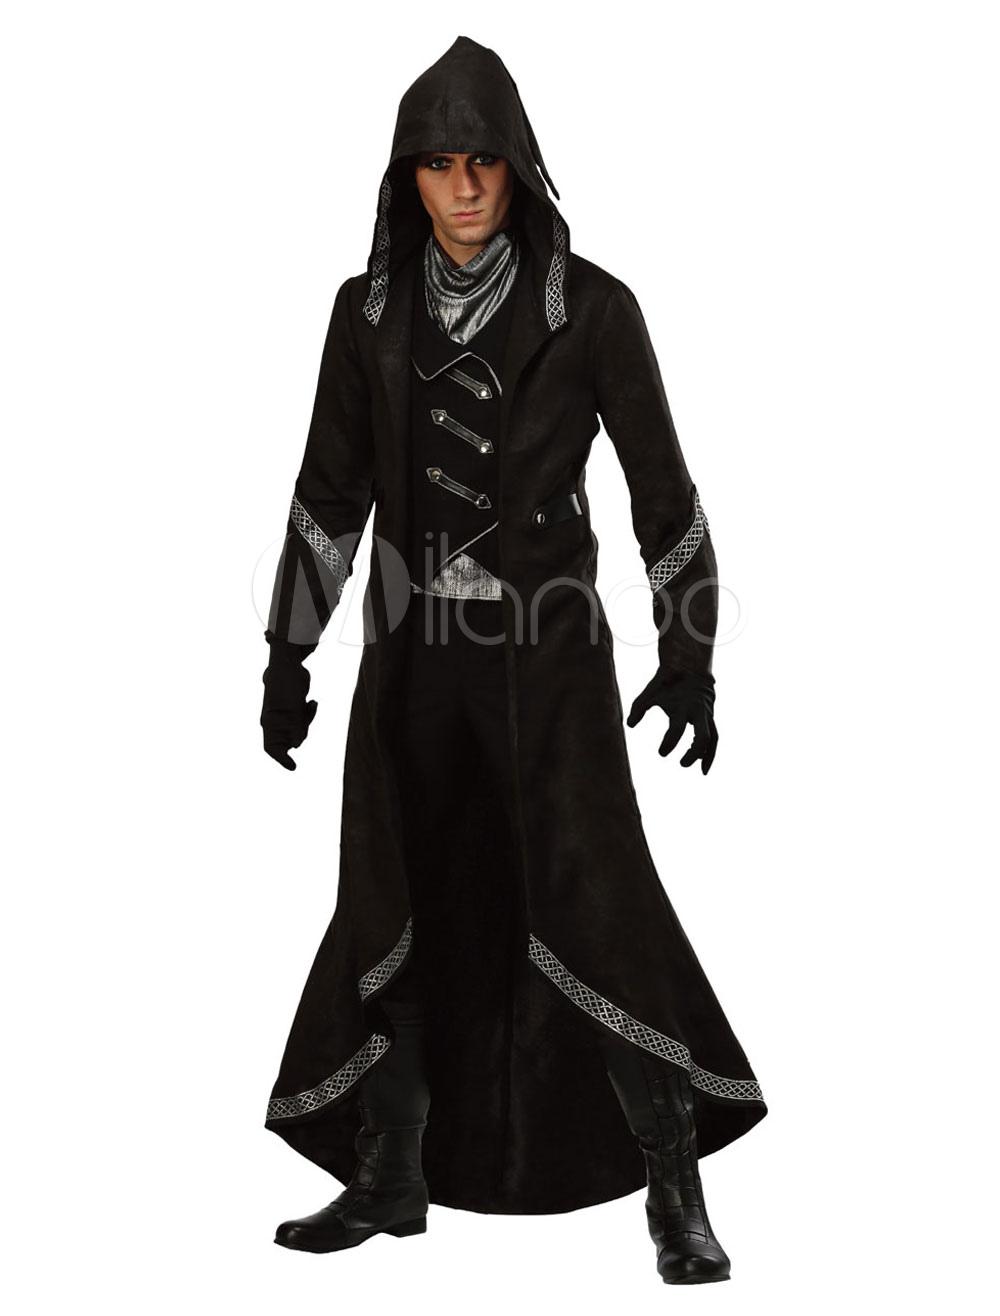 Negima! Magister Negi Magi Halloween Costume Men's Black Hooded Costume Outfit